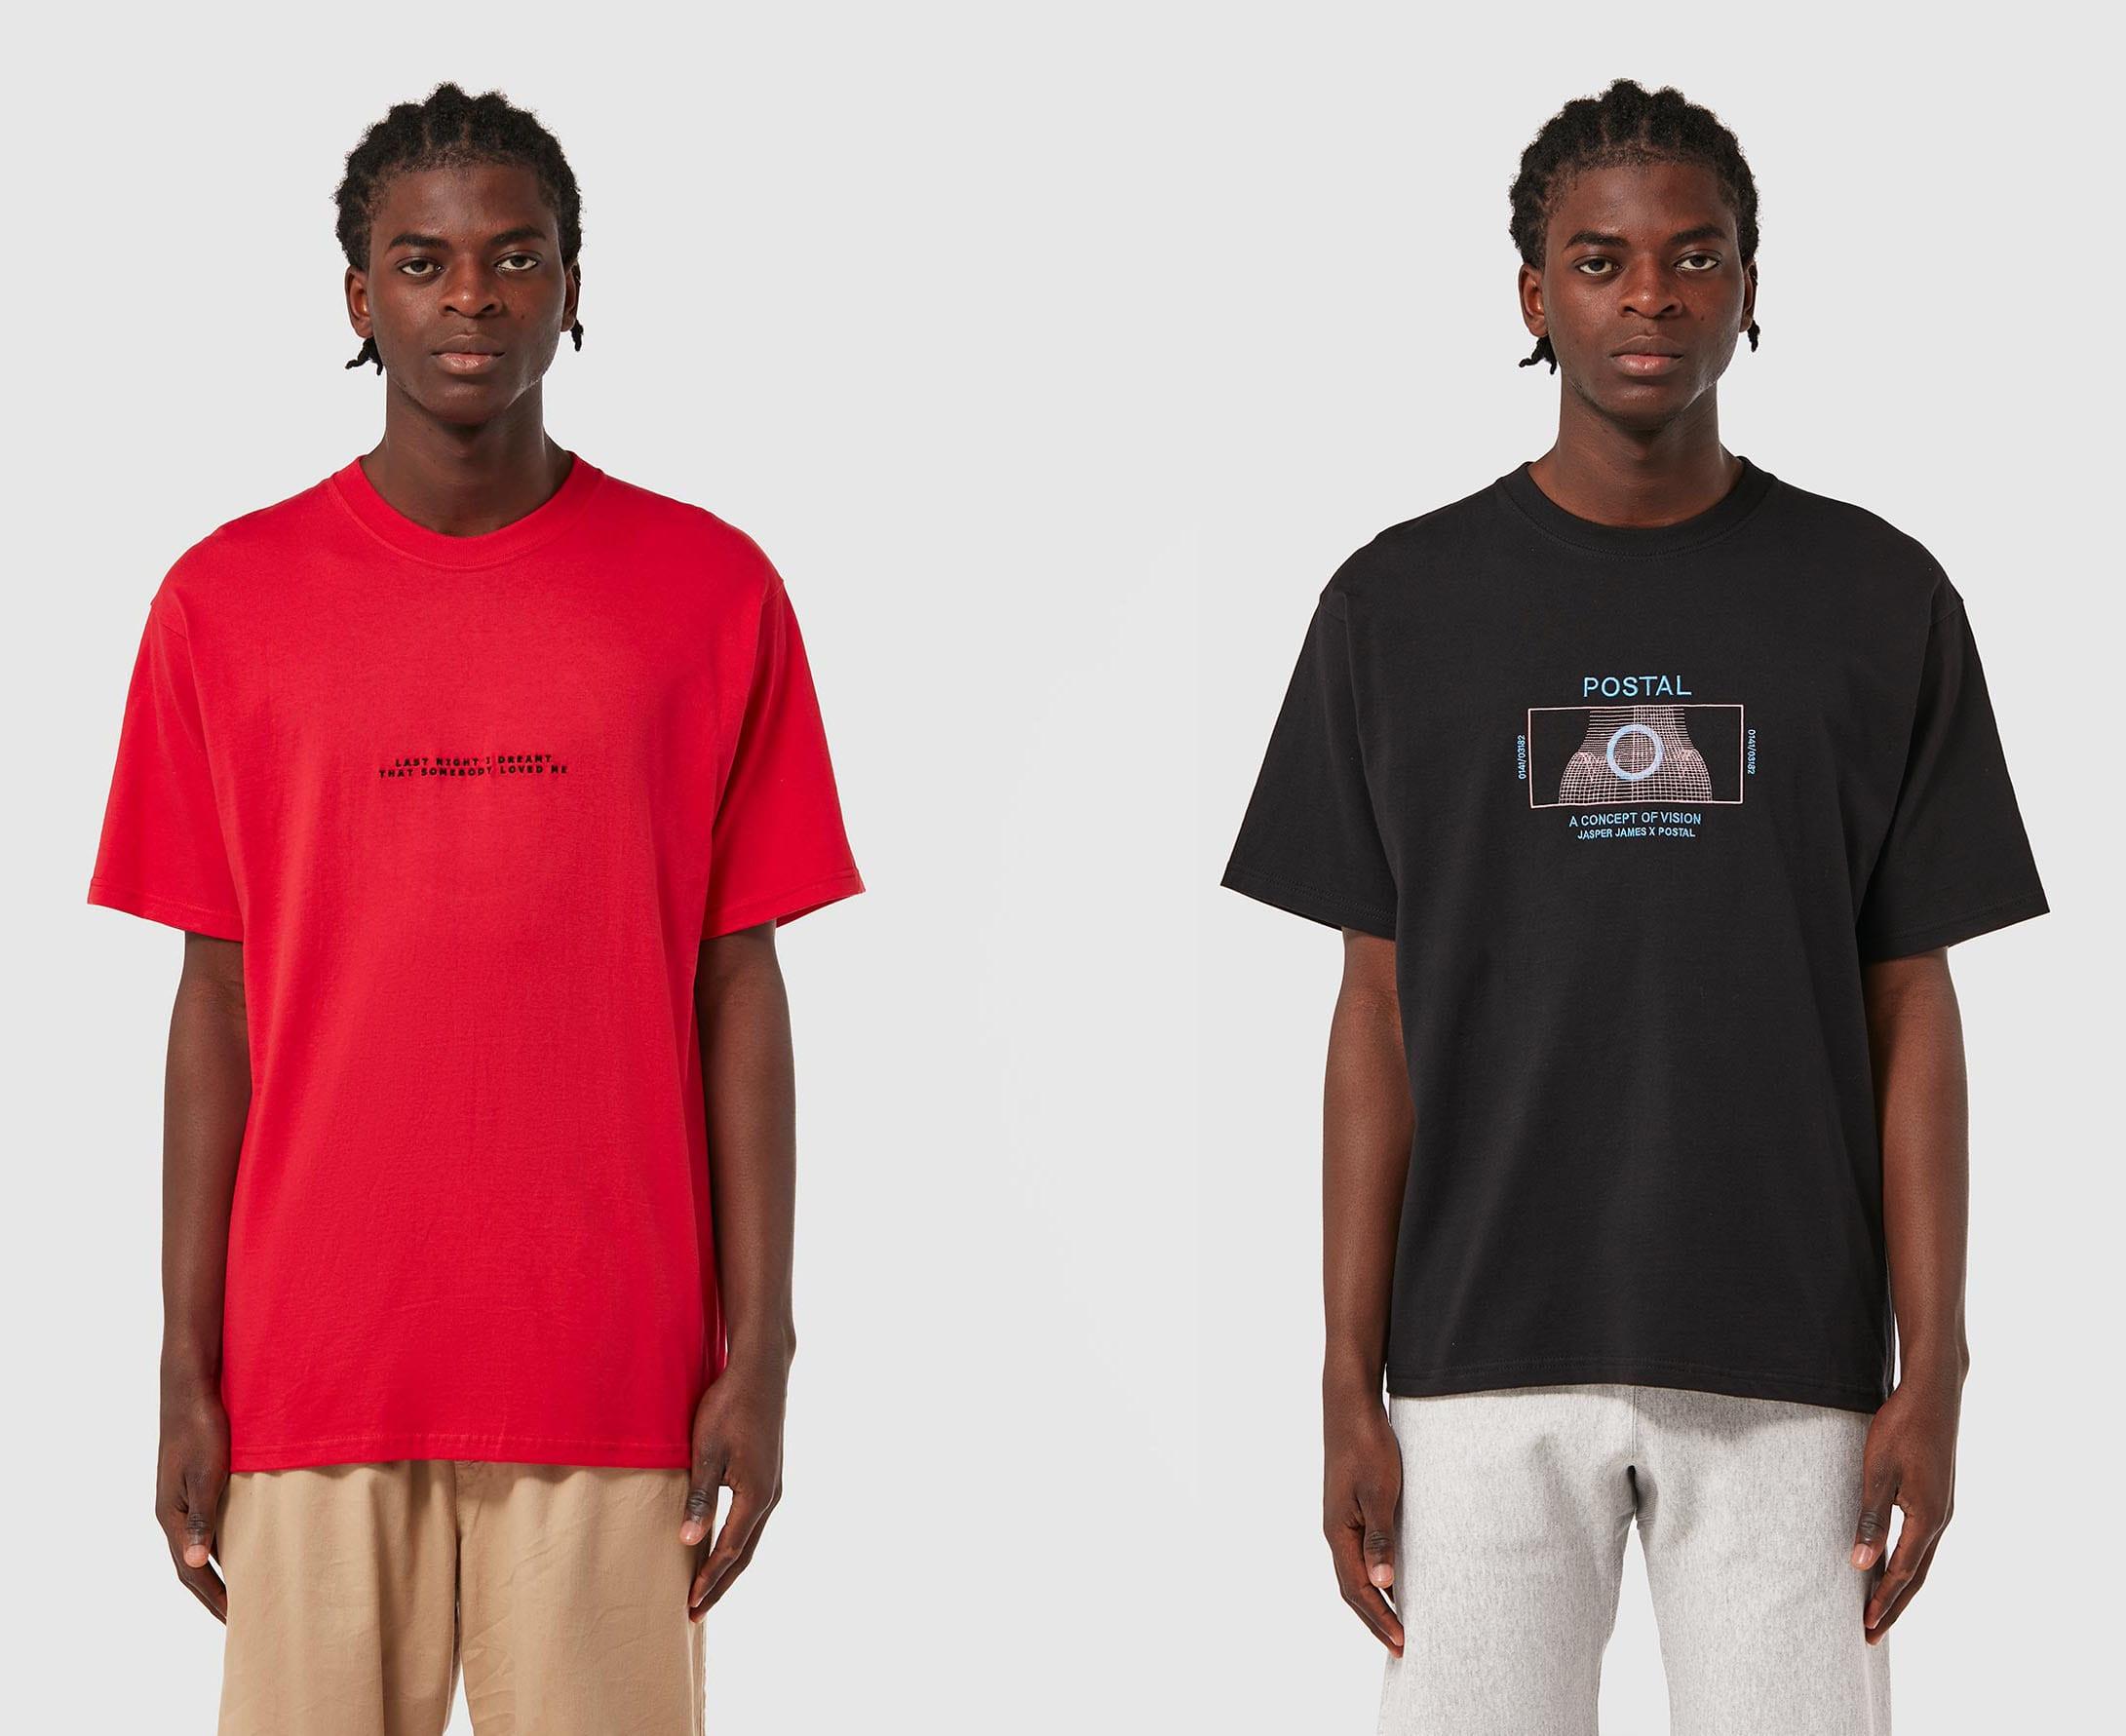 Postal Delivers an Exclusive T-Shirt Capsule via SEVENSTORE